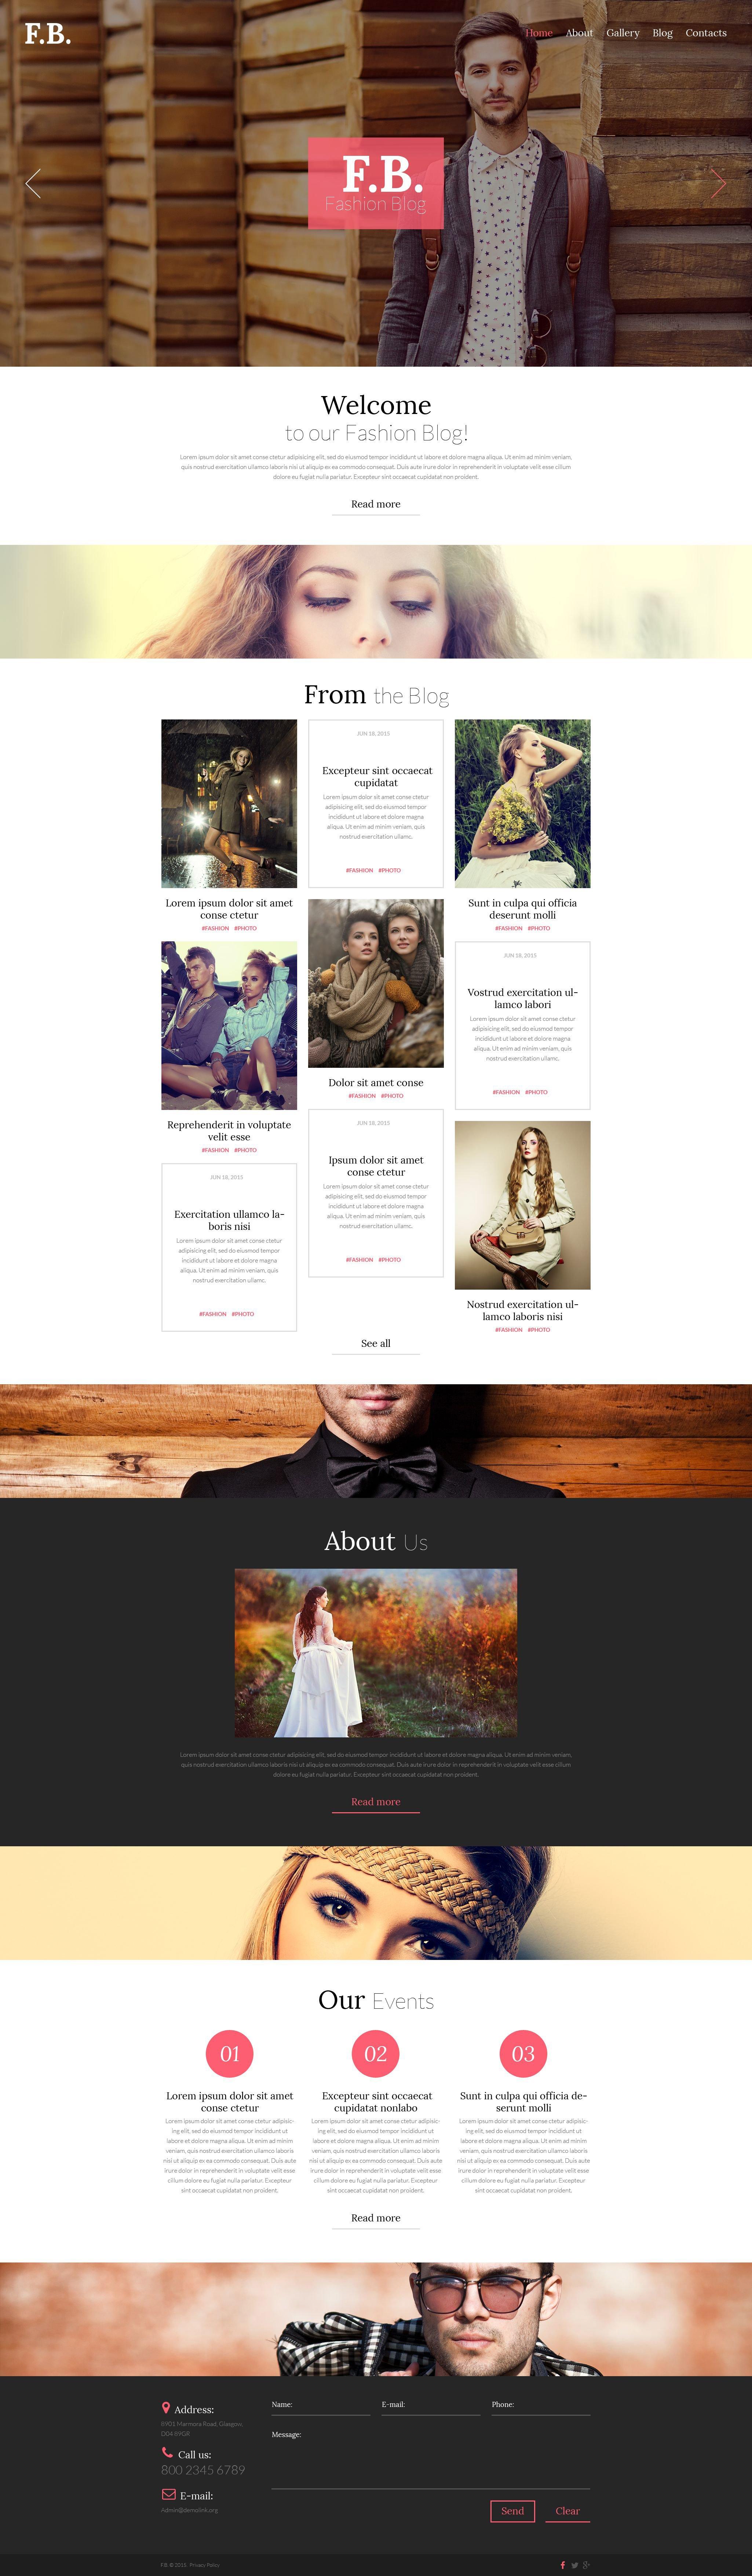 Responsivt Fashion WordPress-tema #53435 - skärmbild